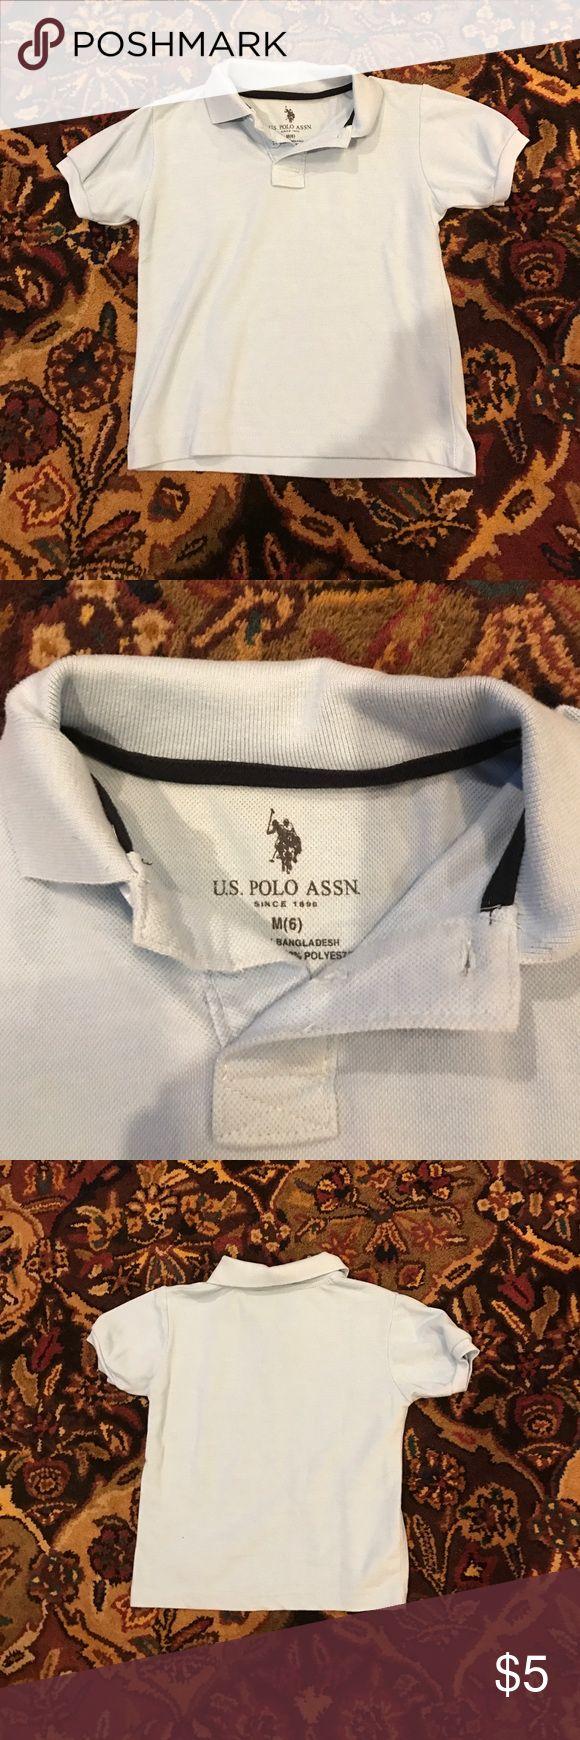 Boys pale blue polo 6 euc Boys light blue us polo association polo size 6 - excellent condition us polo association Shirts & Tops Polos